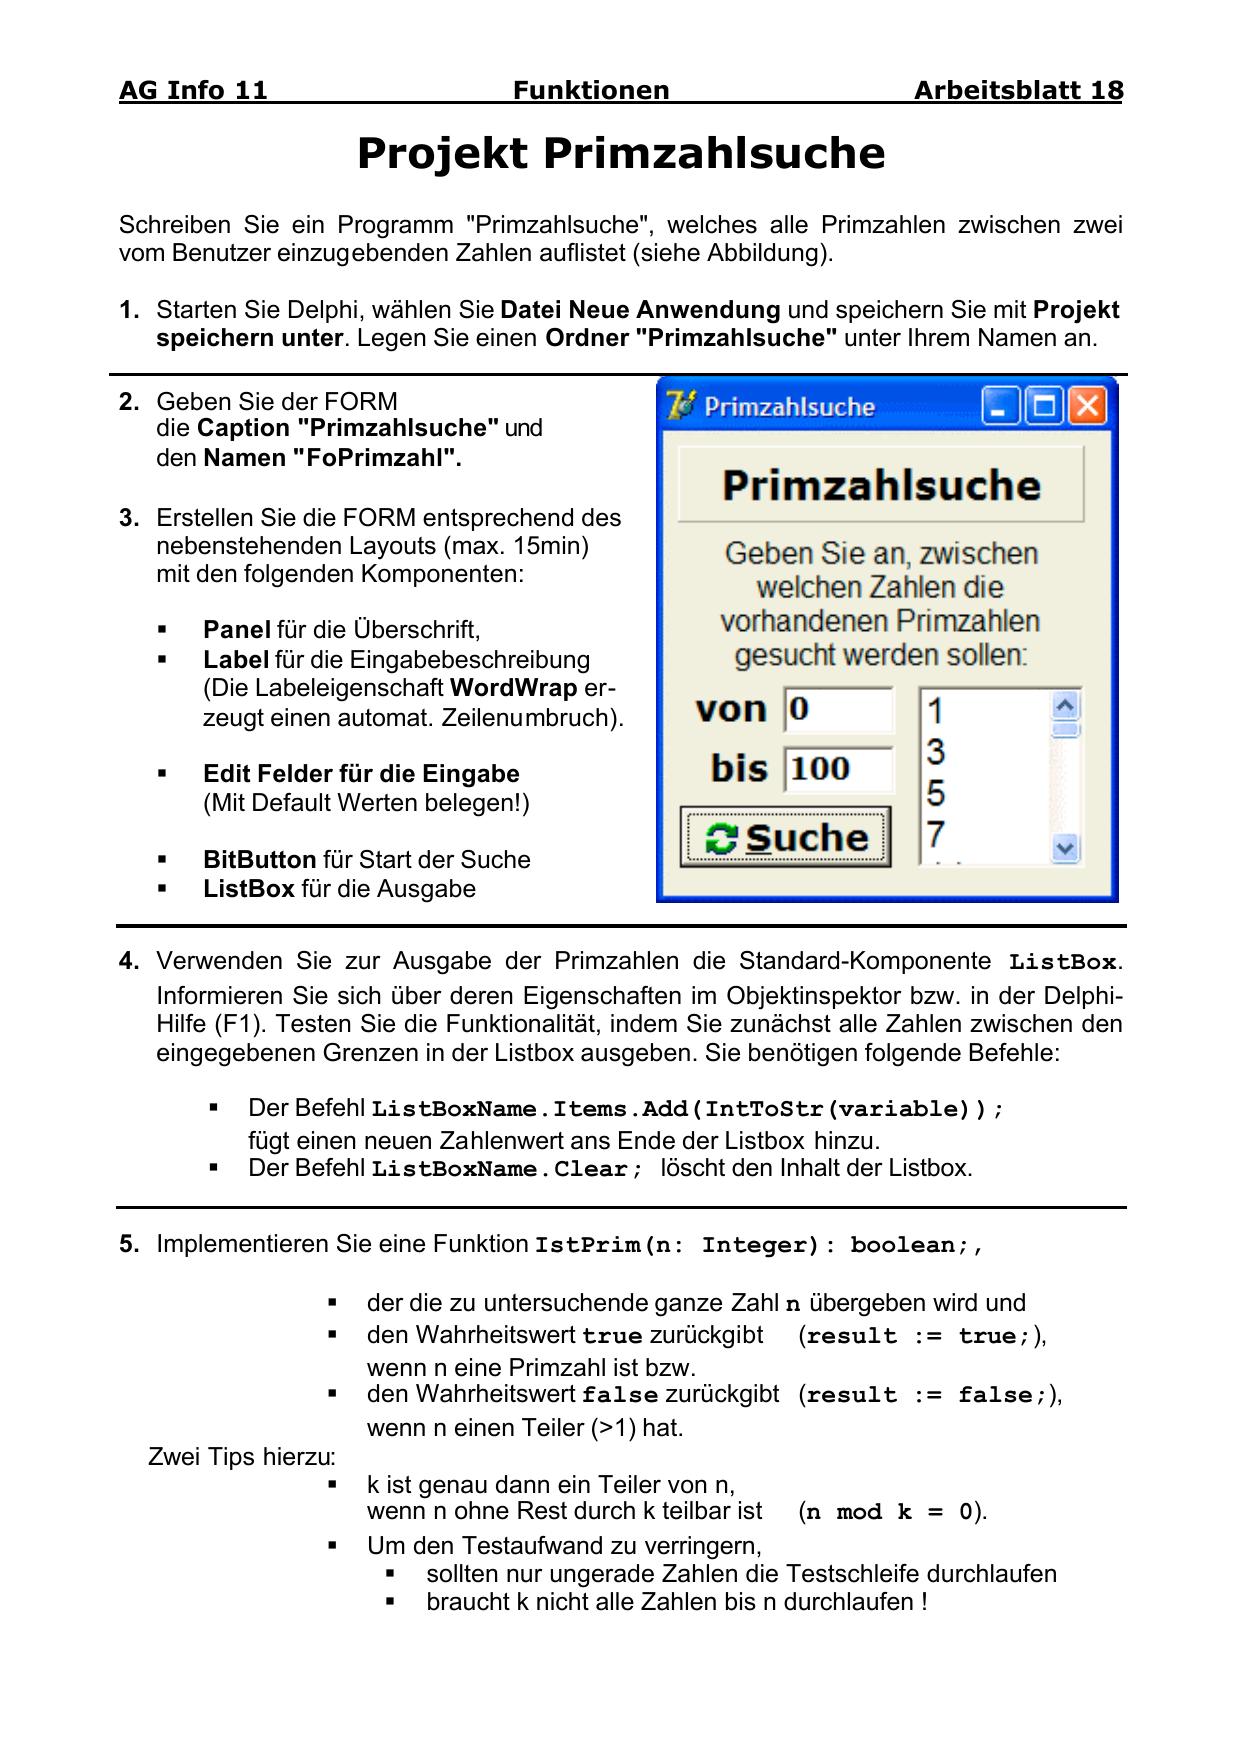 Projekt Primzahlsuche